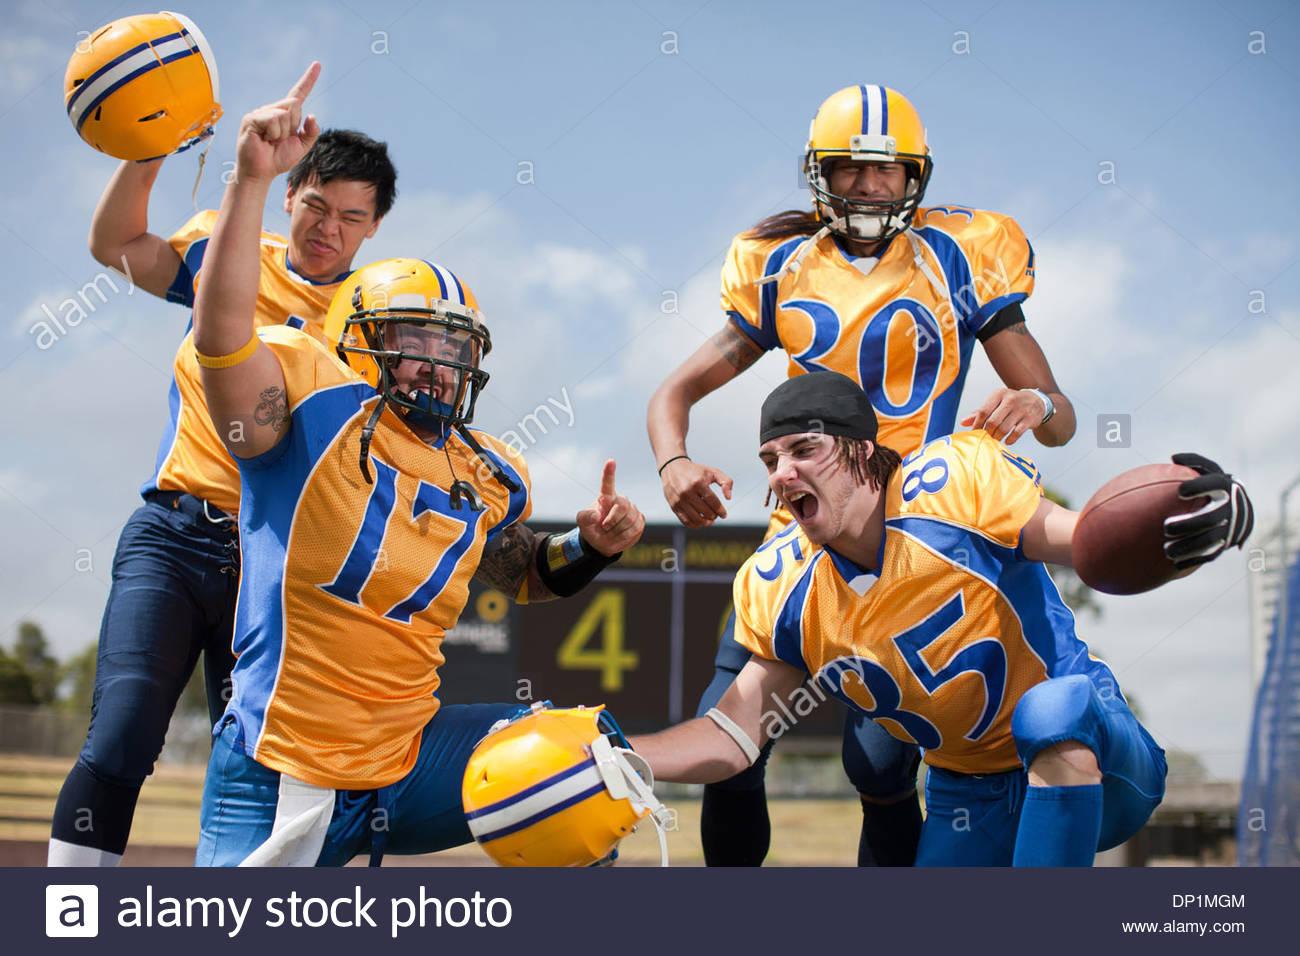 Winning football players cheering - Stock Image